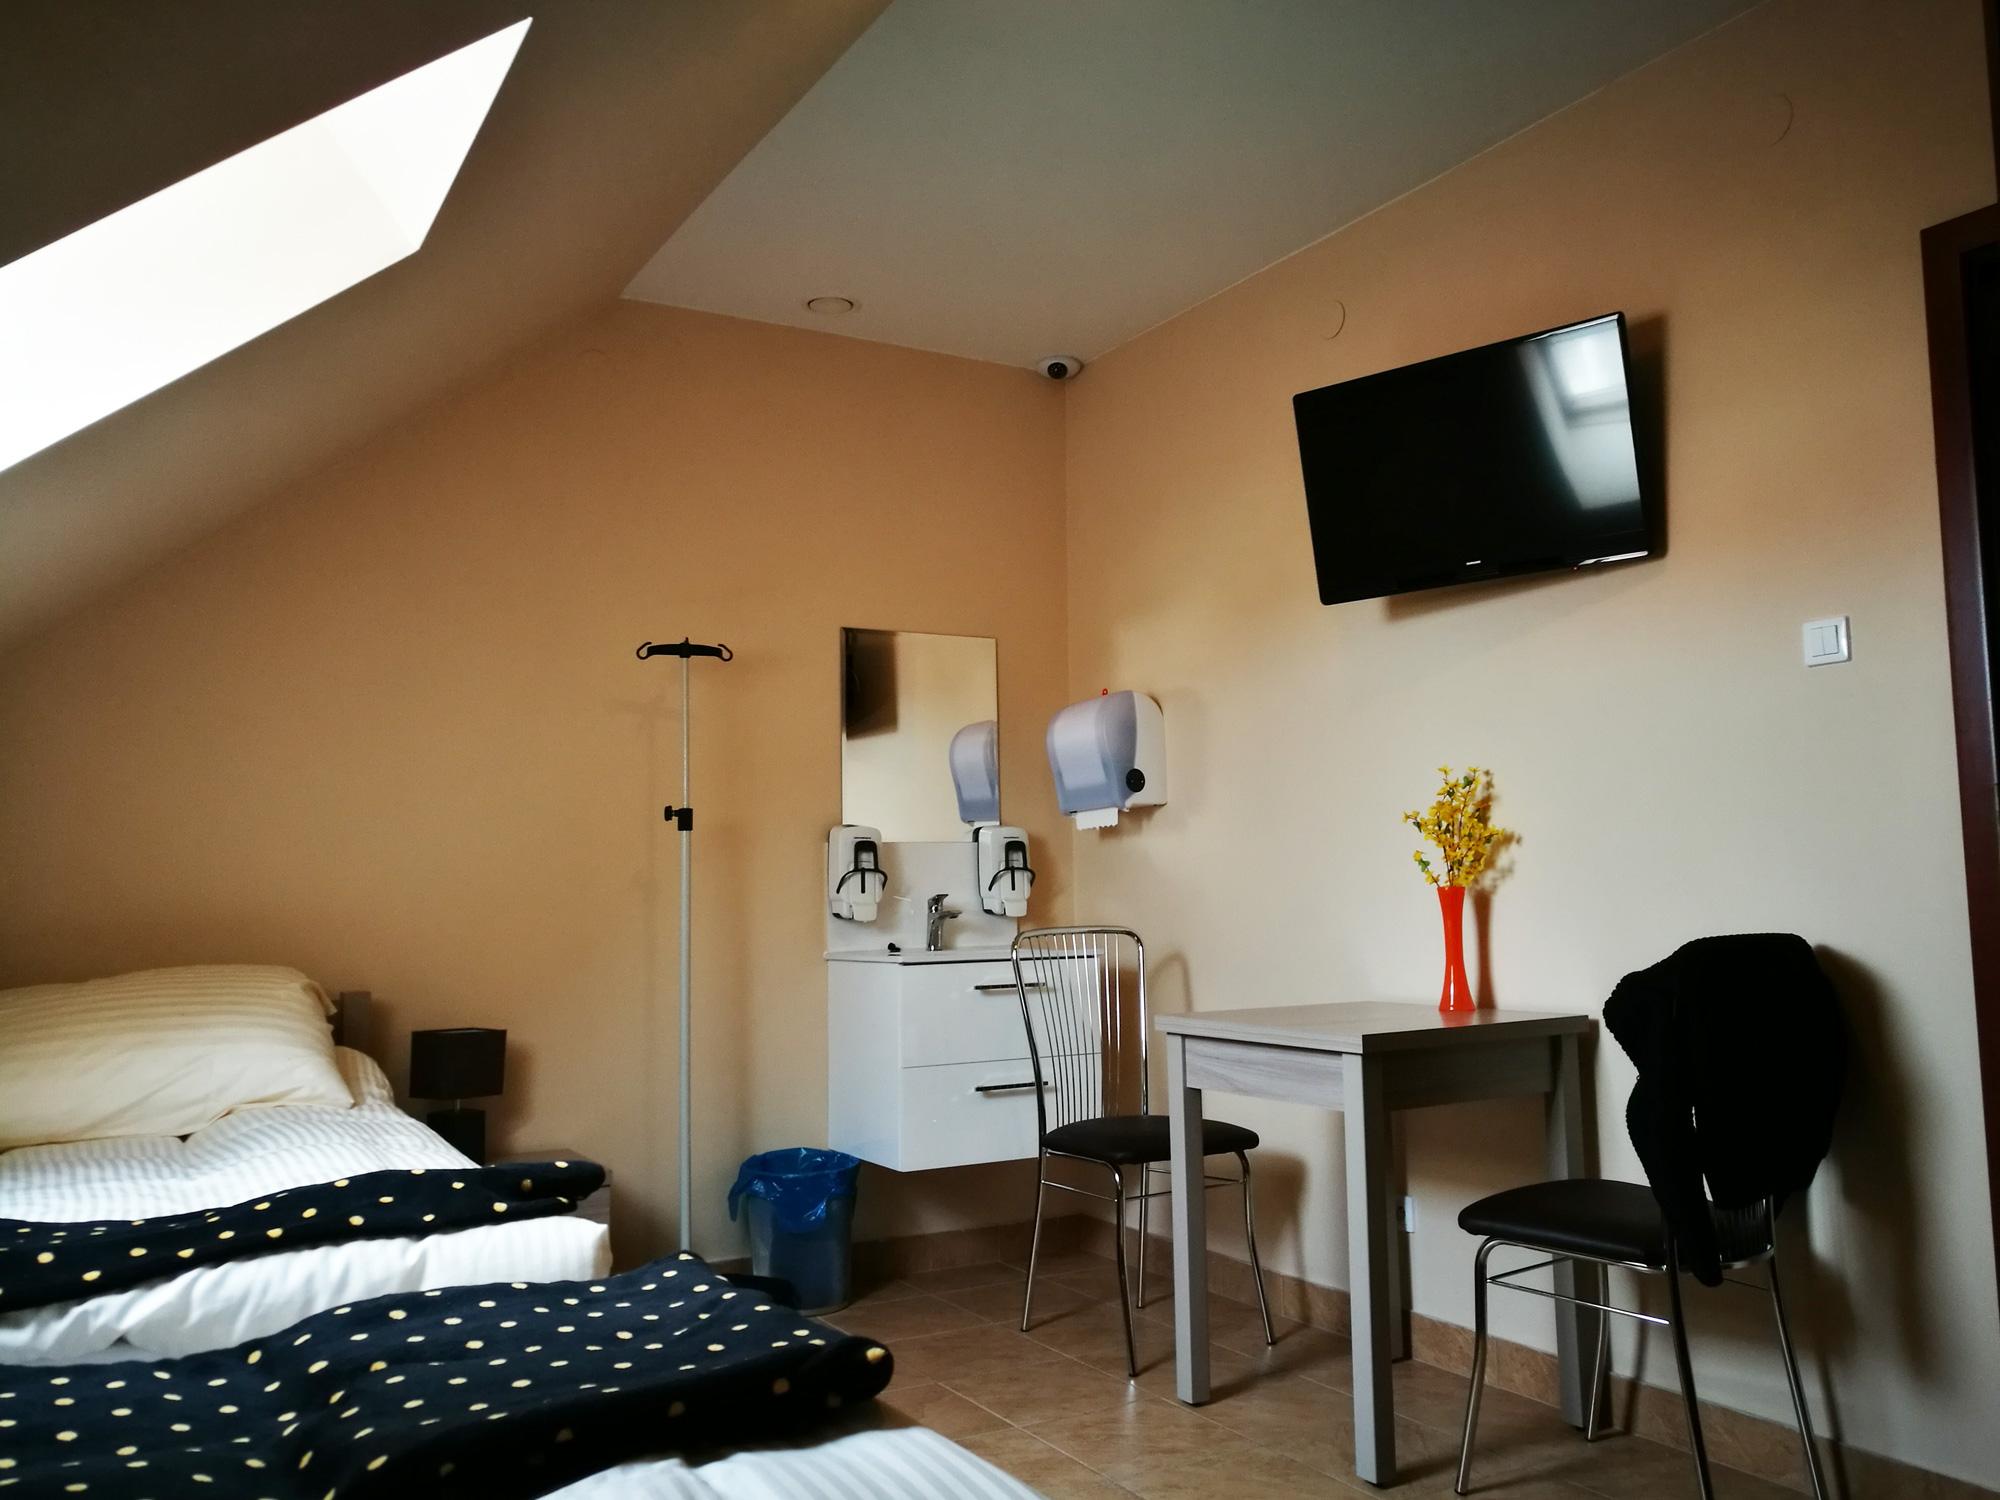 Ośrodek Terapii Uzależnień MedJol